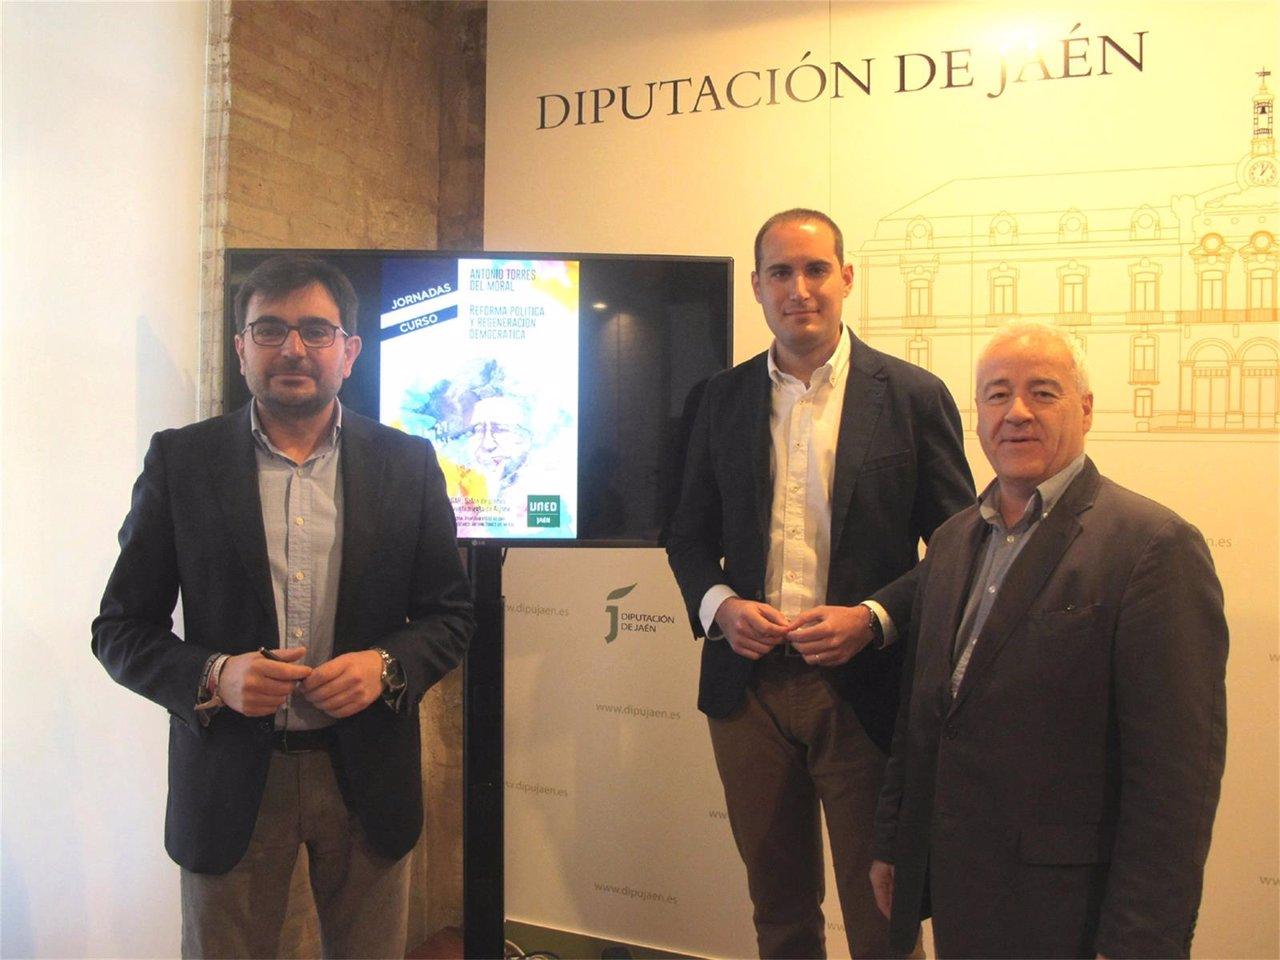 Pérez, Latorre y Medina presentan las jornadas sobre reforma política.